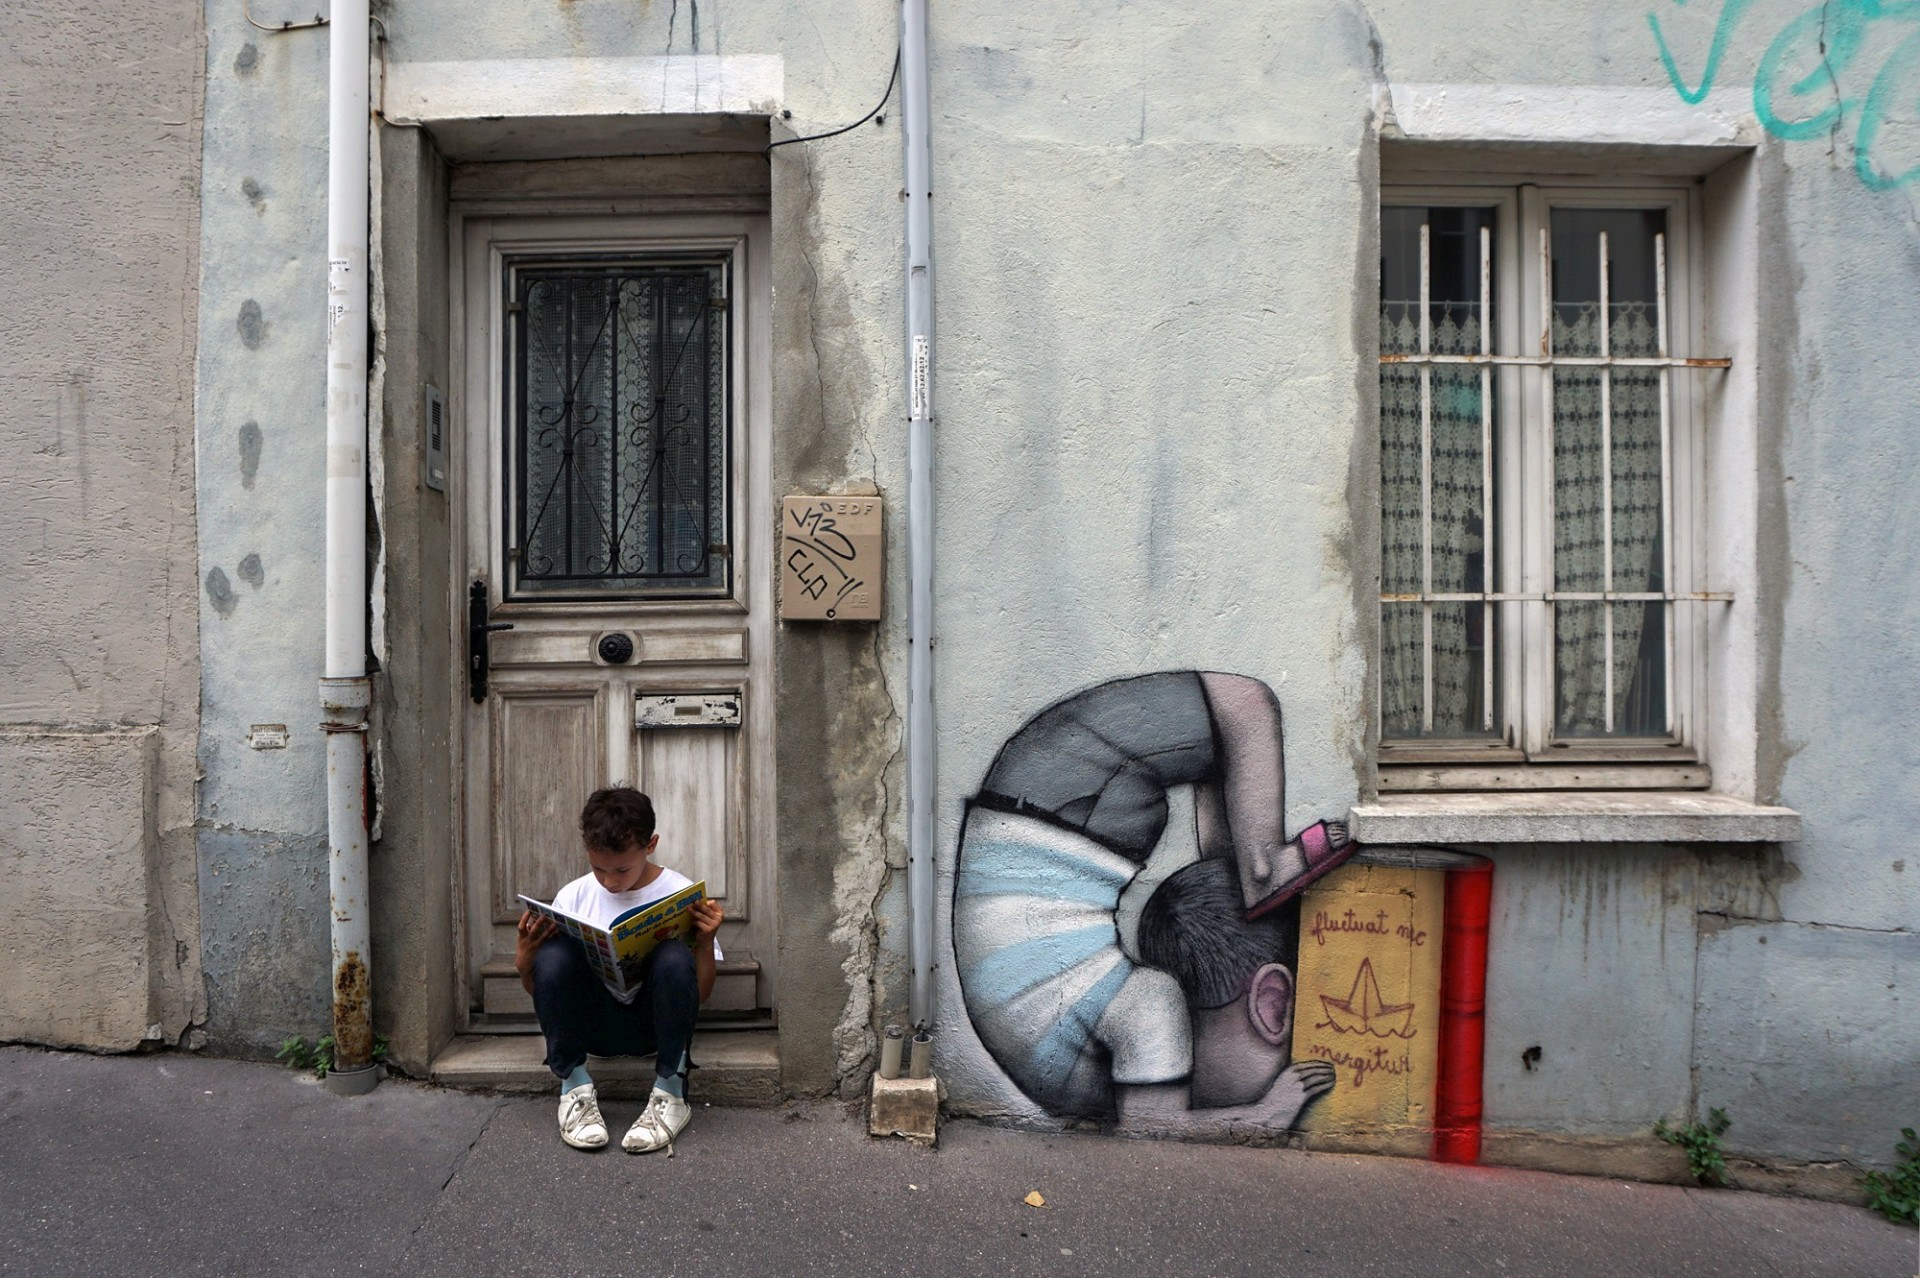 Чудо детства 2018_paris-rue-buot-960x639@2x.jpg